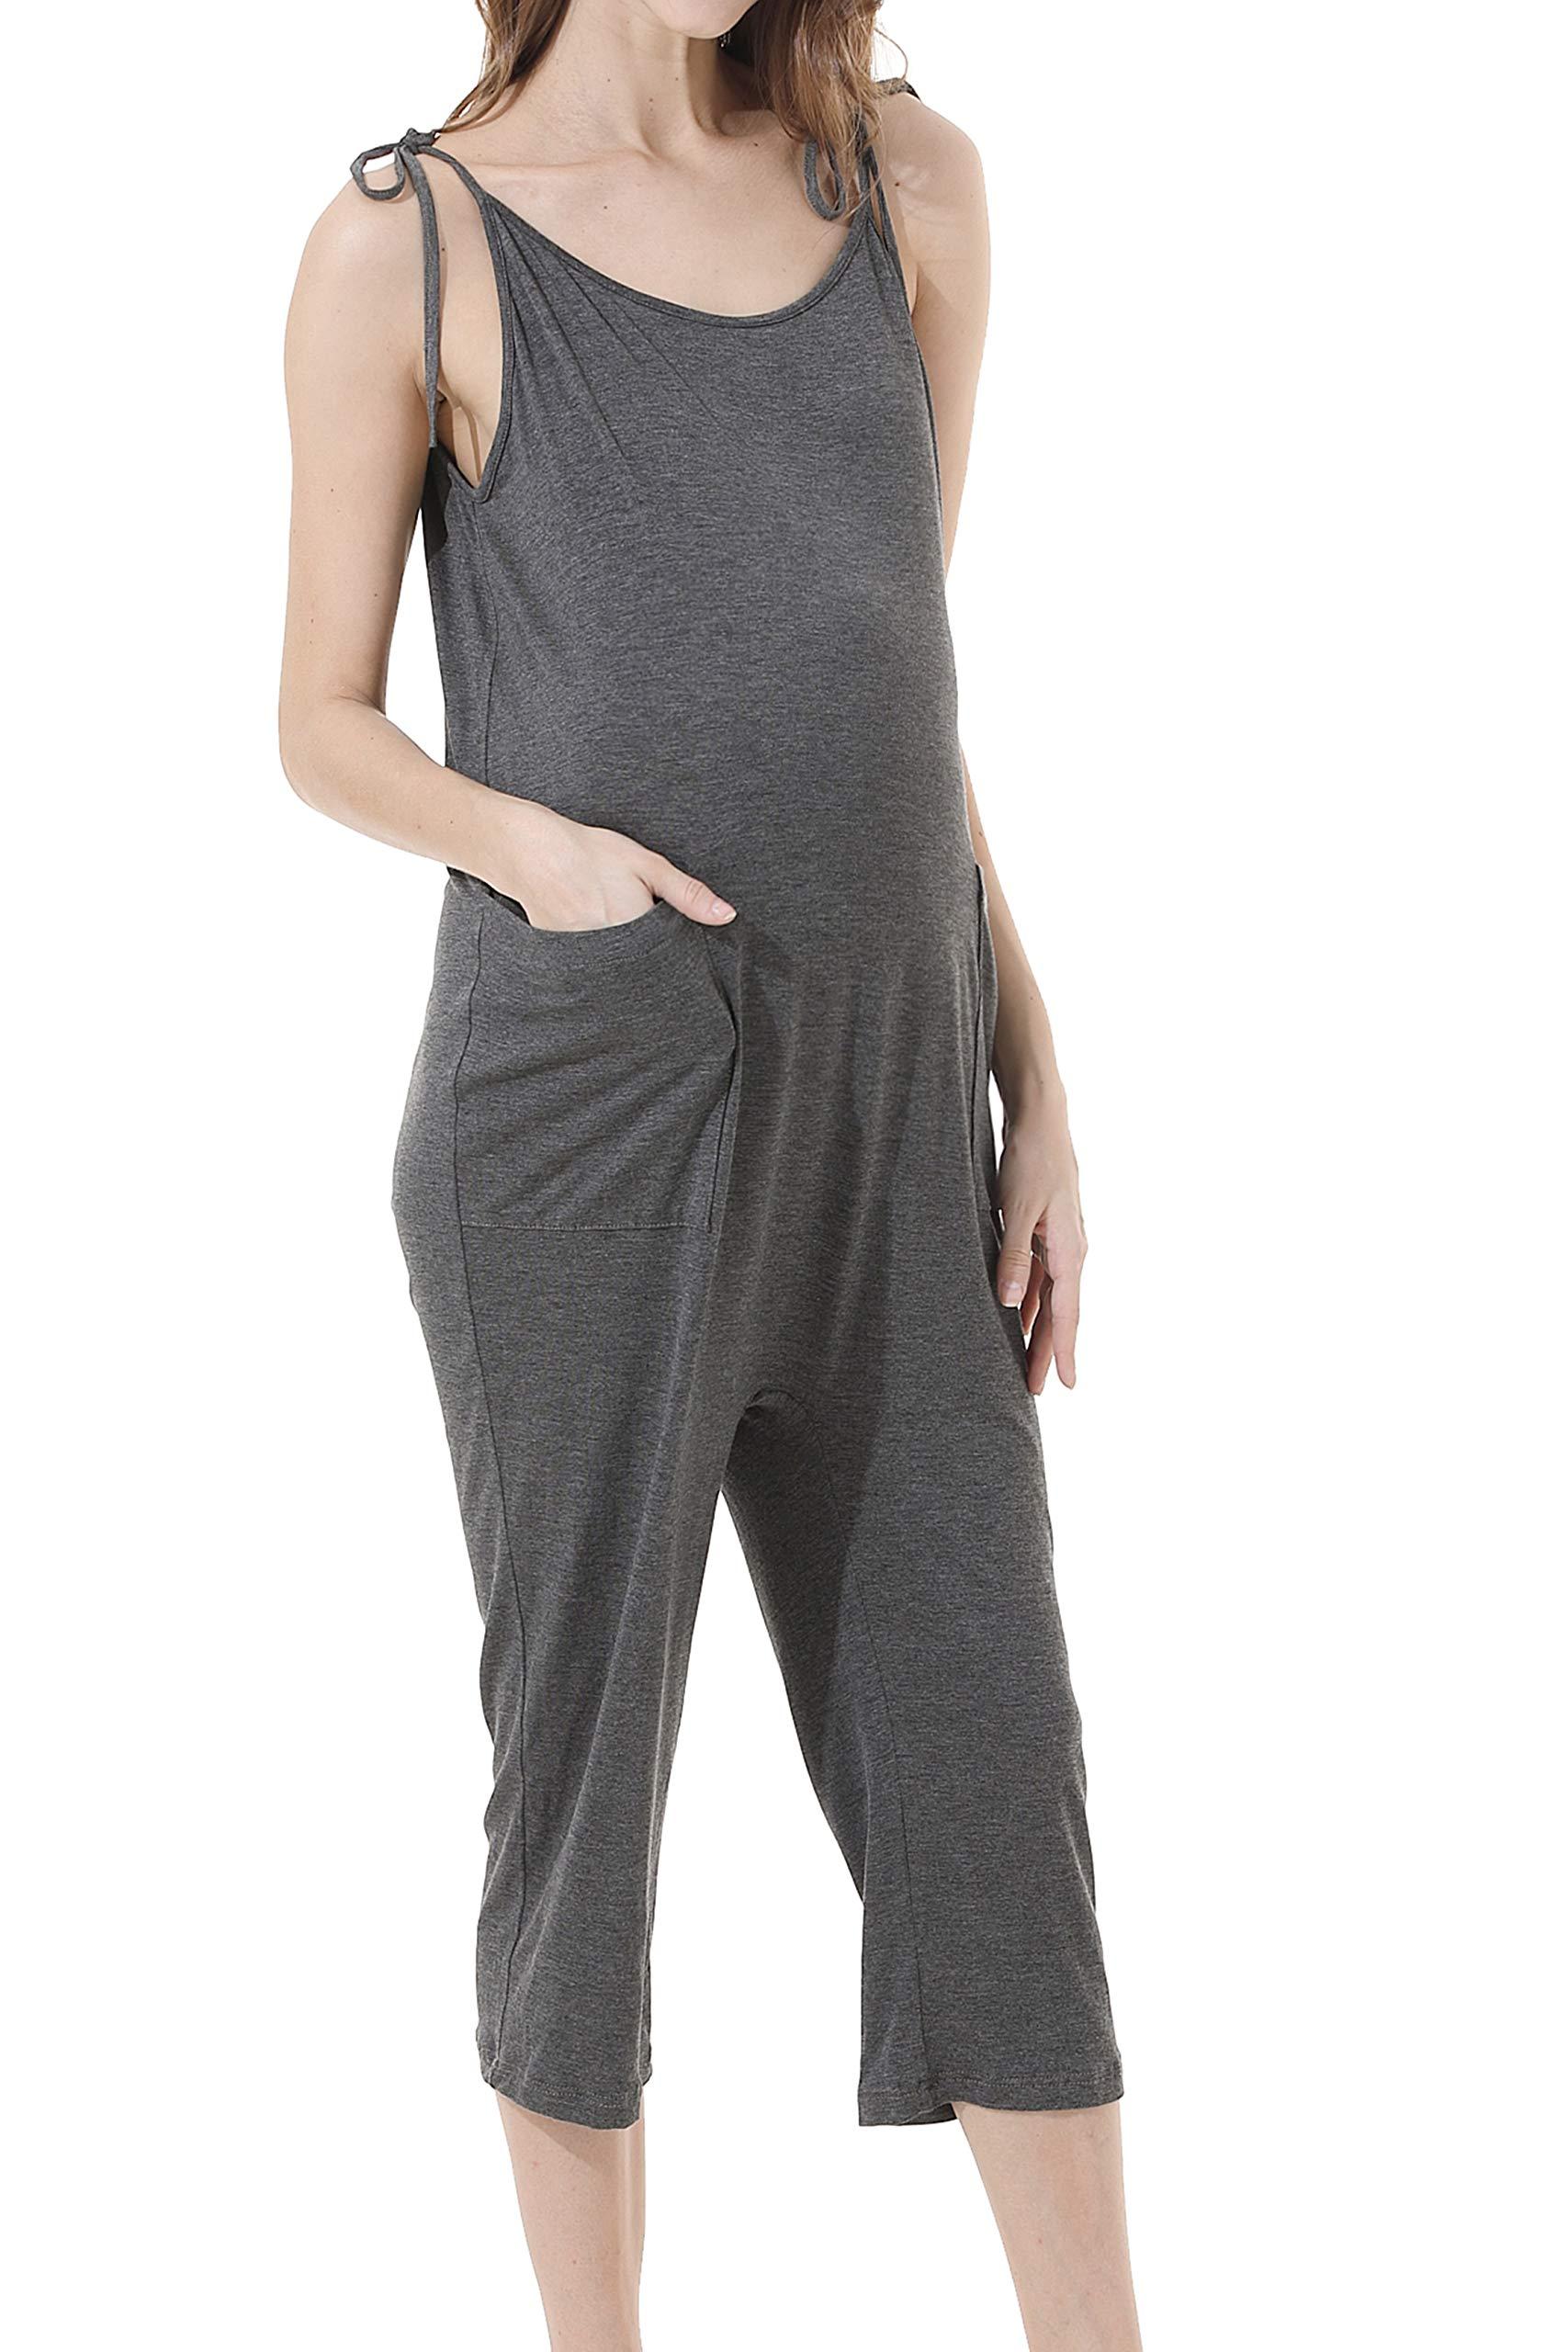 Avv Women's Casual Elegant Spaghetti Strap Loose Jumpsuit Romper with Pockets (Gray, S)